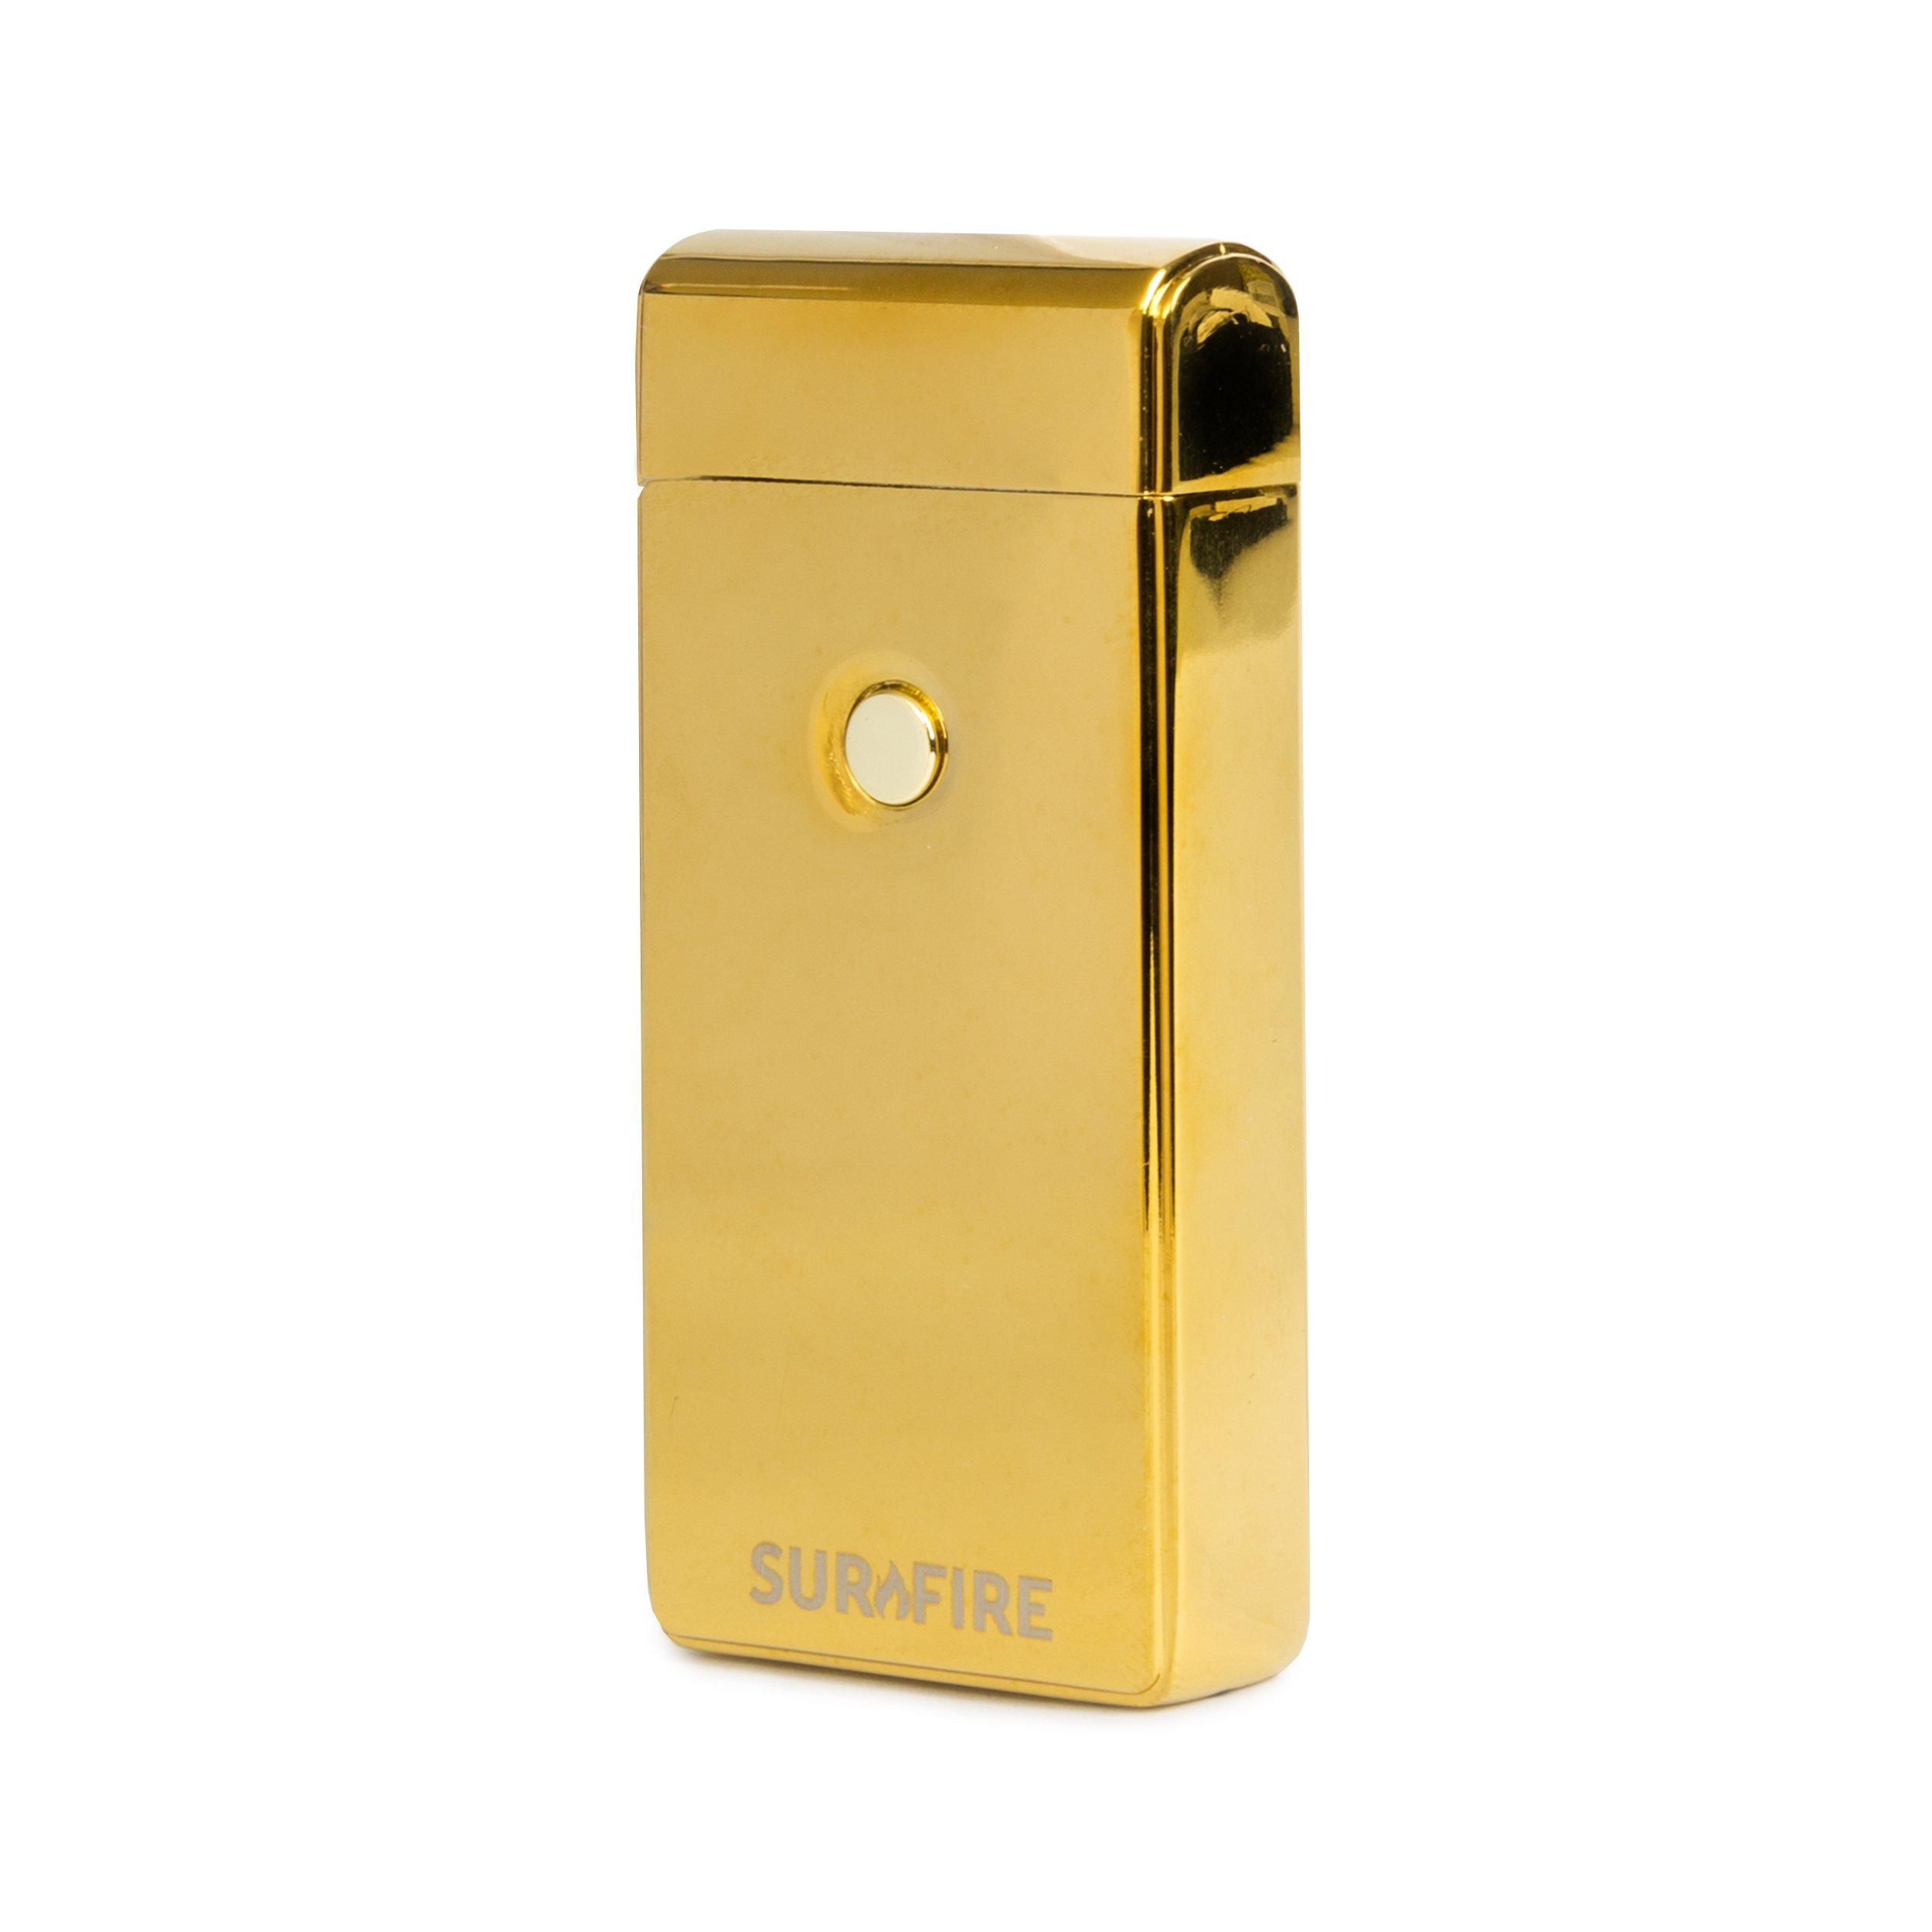 SurFire Windproof Dual Arc USB Rechargeable Plasma Lighter (Medallion)